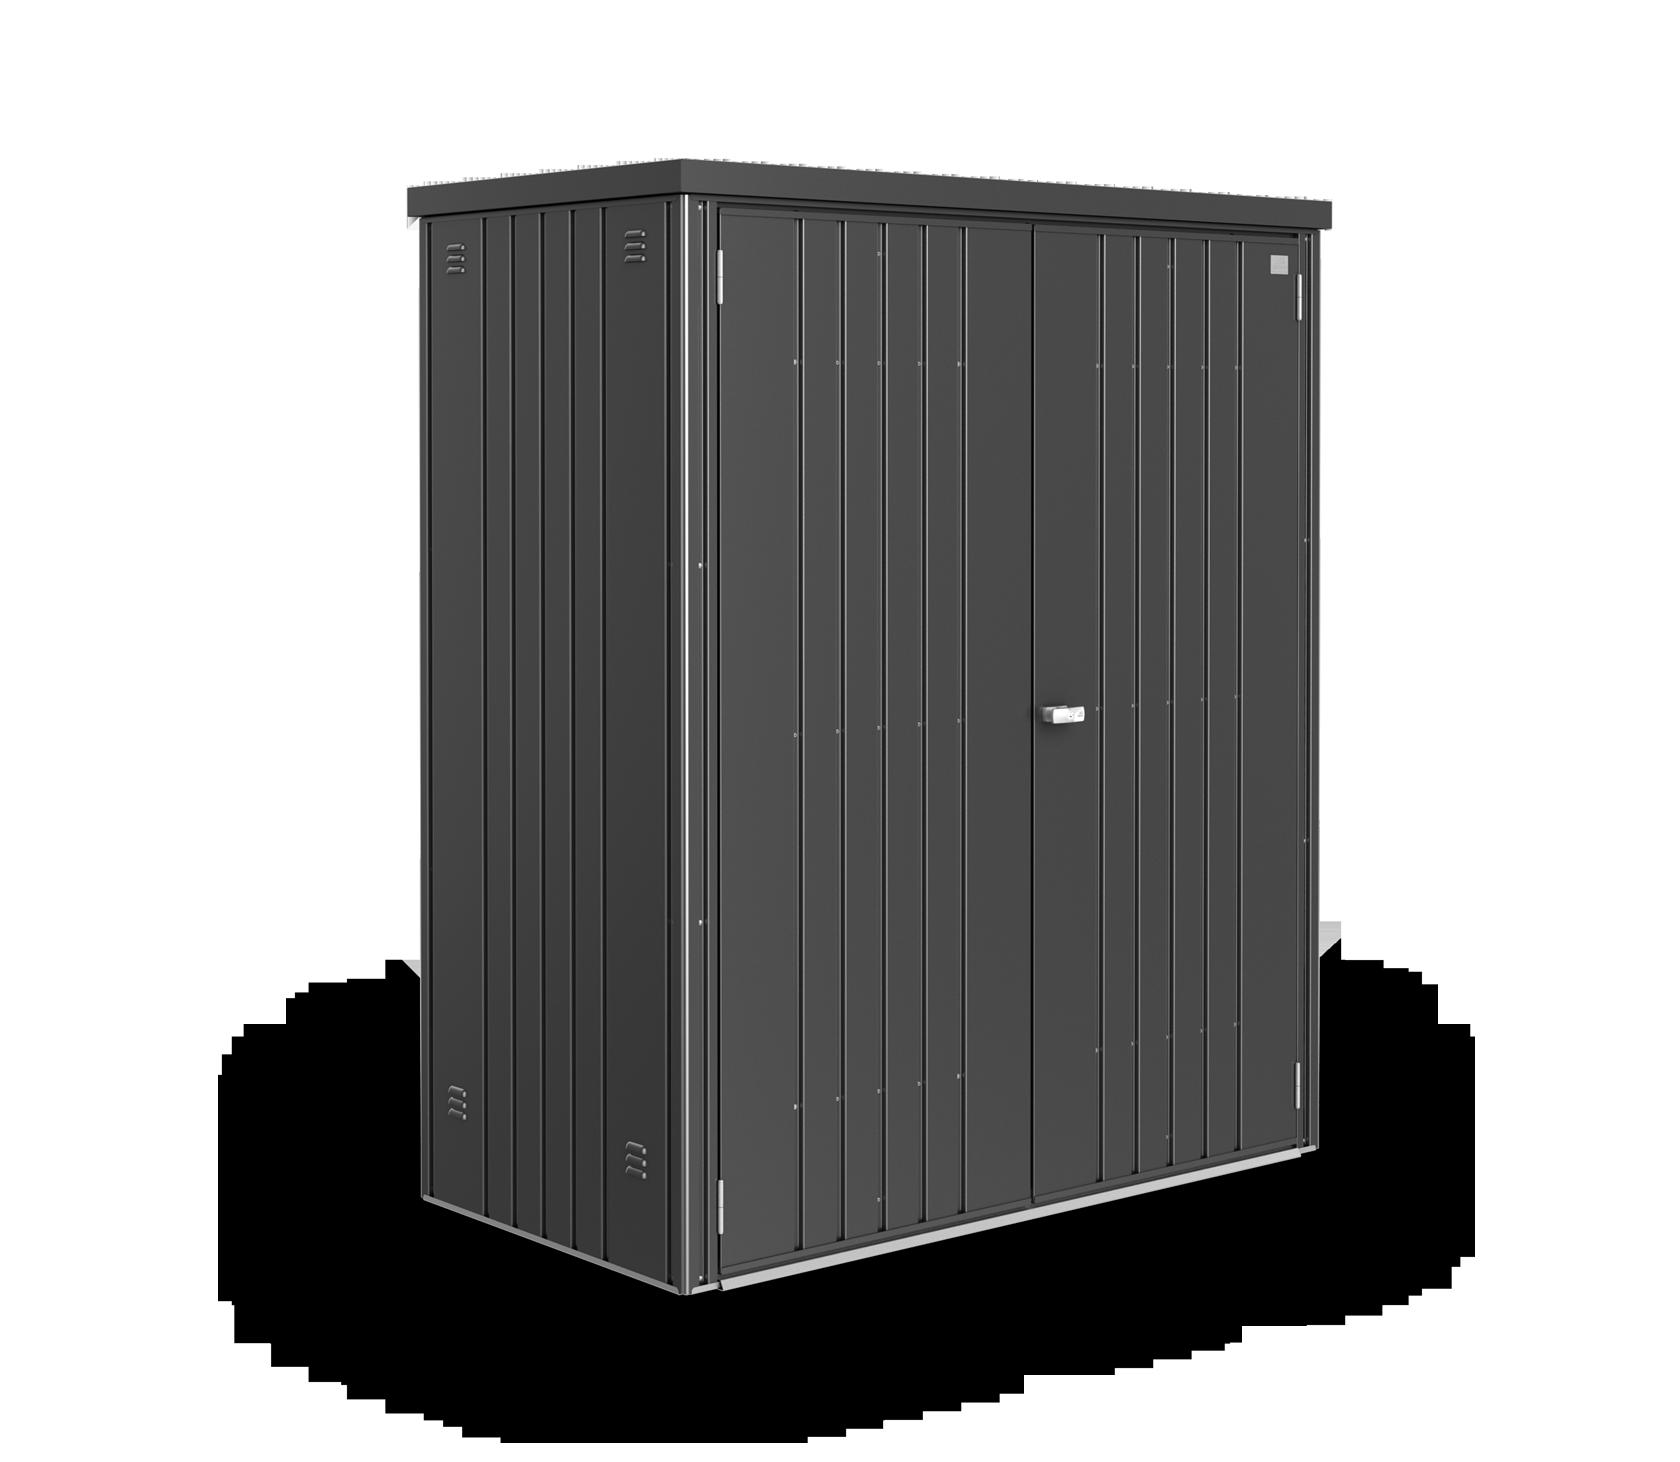 Biohort Equipment Locker Made Of Metal